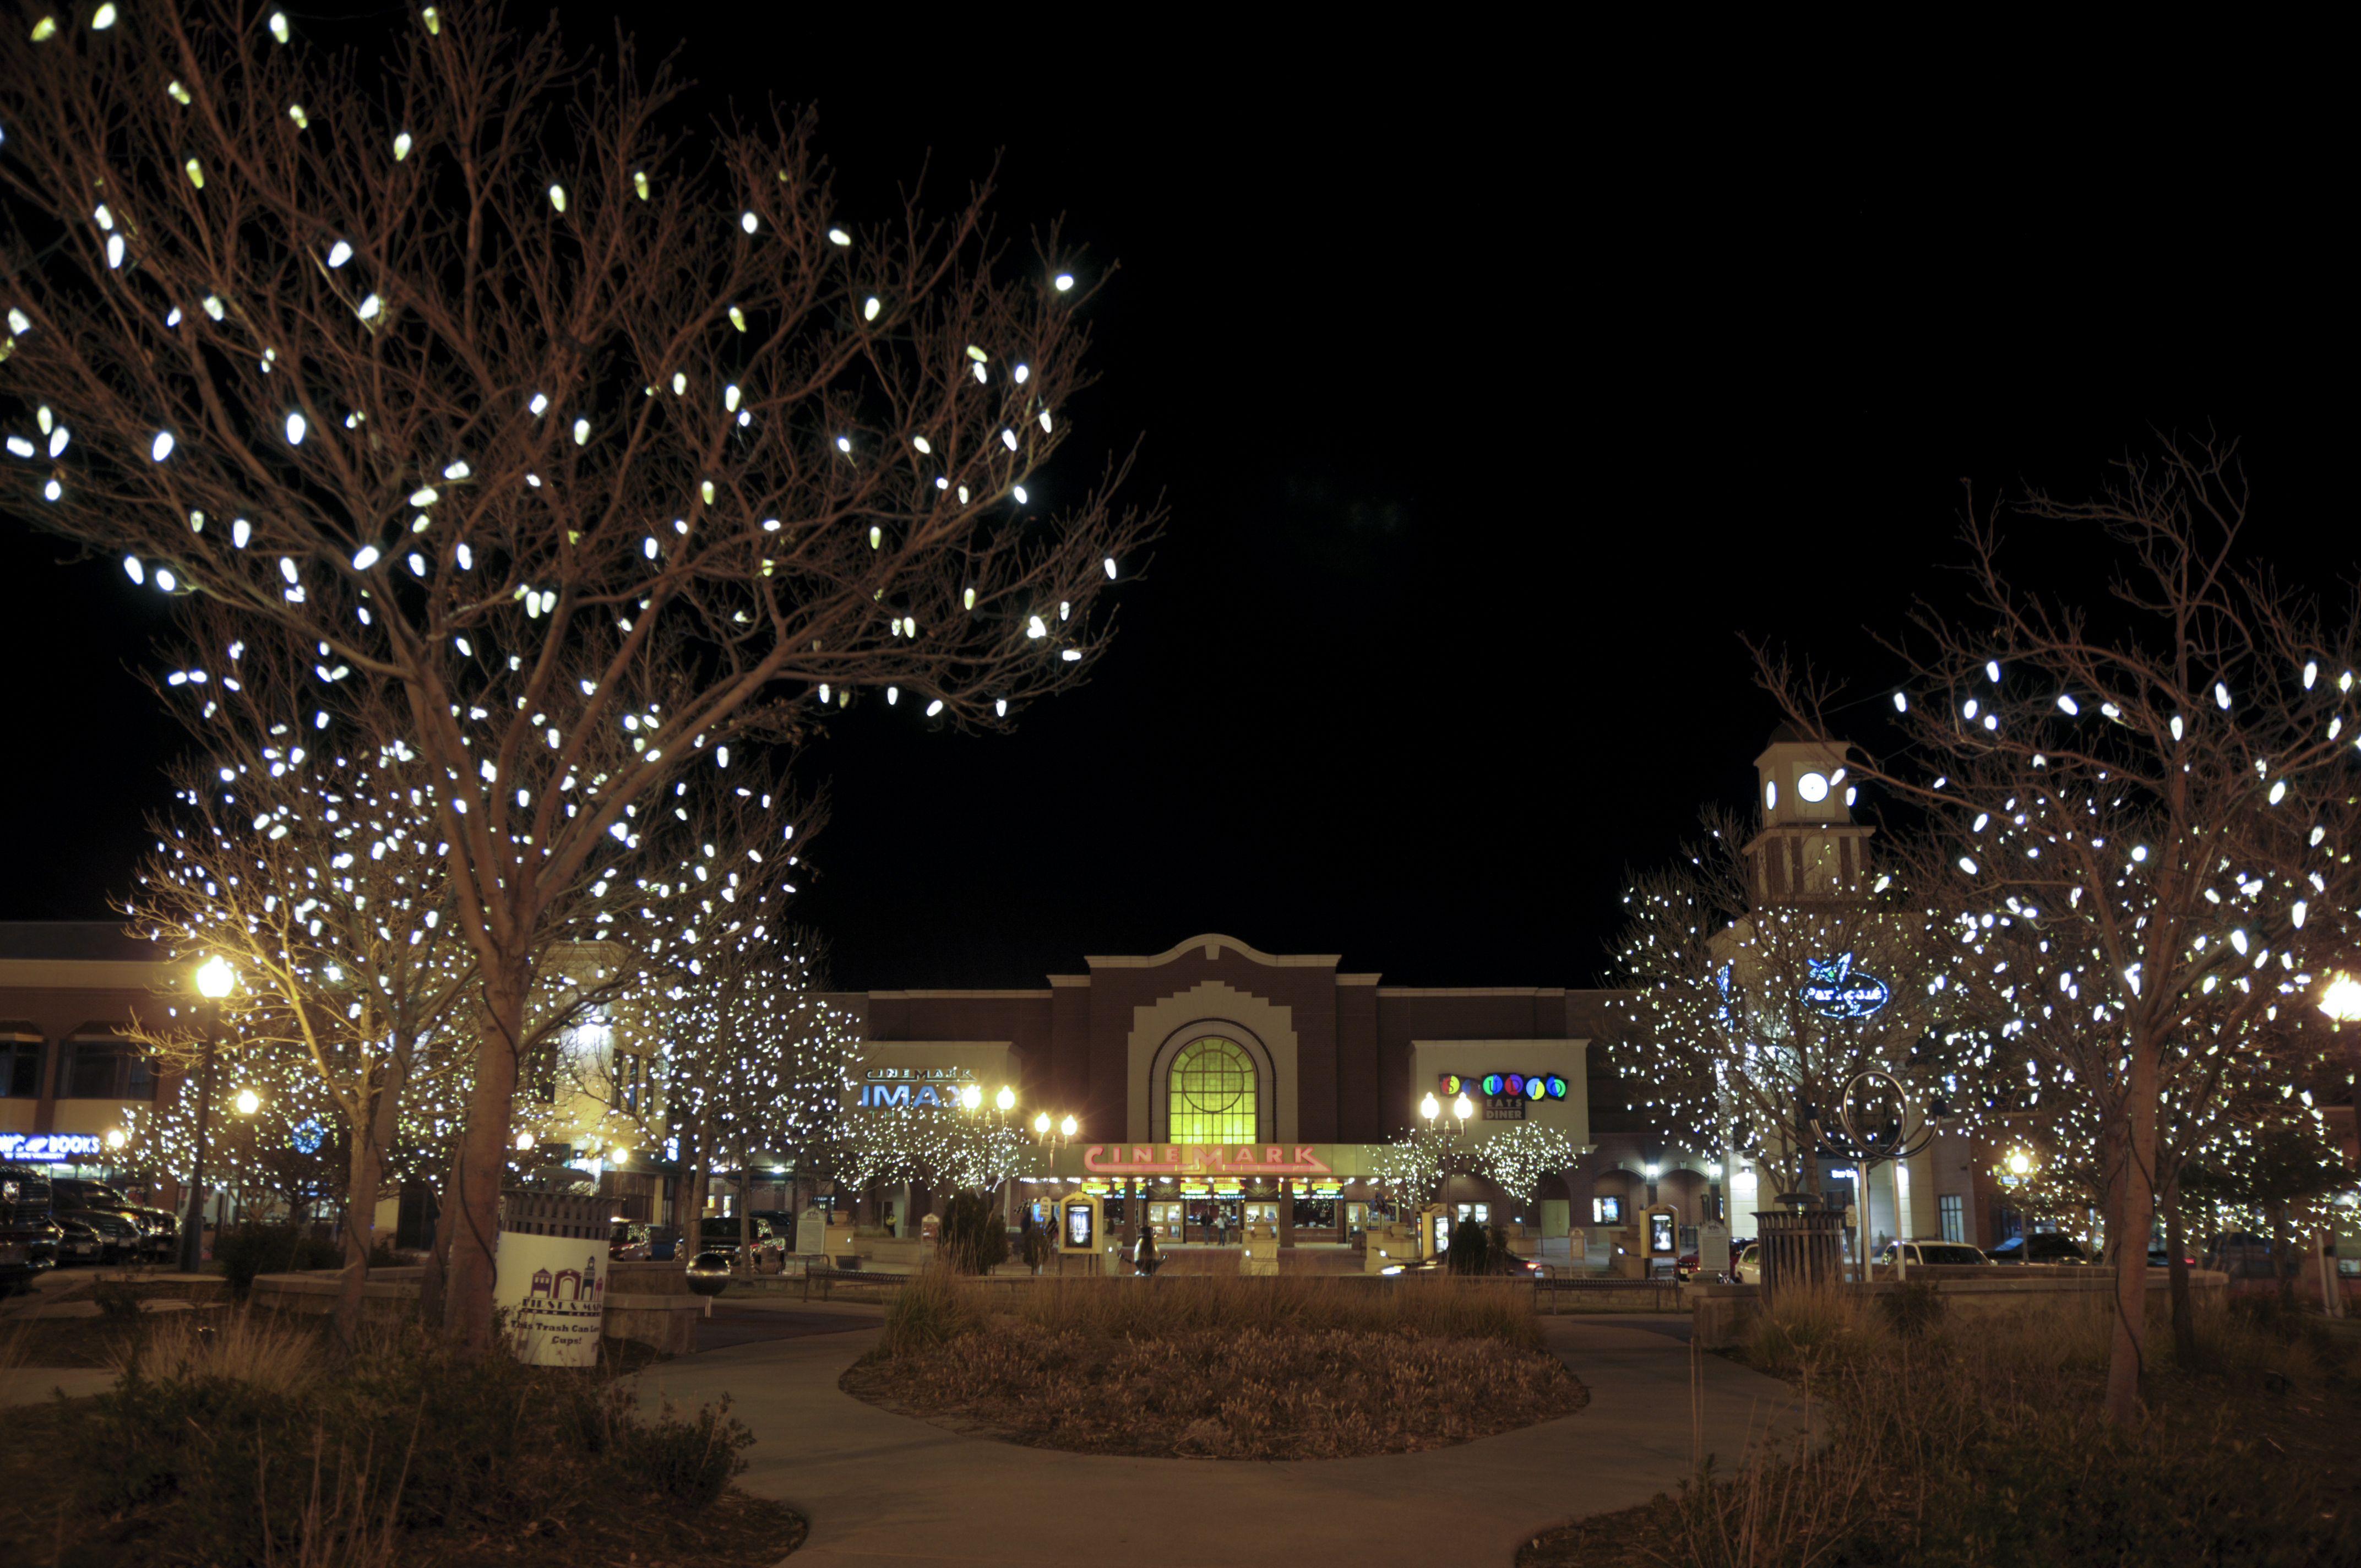 Commercial Christmas Light Installation Colorado Springs Outdoor Christmas Decorations Outdoor Christmas Commercial Christmas Lights